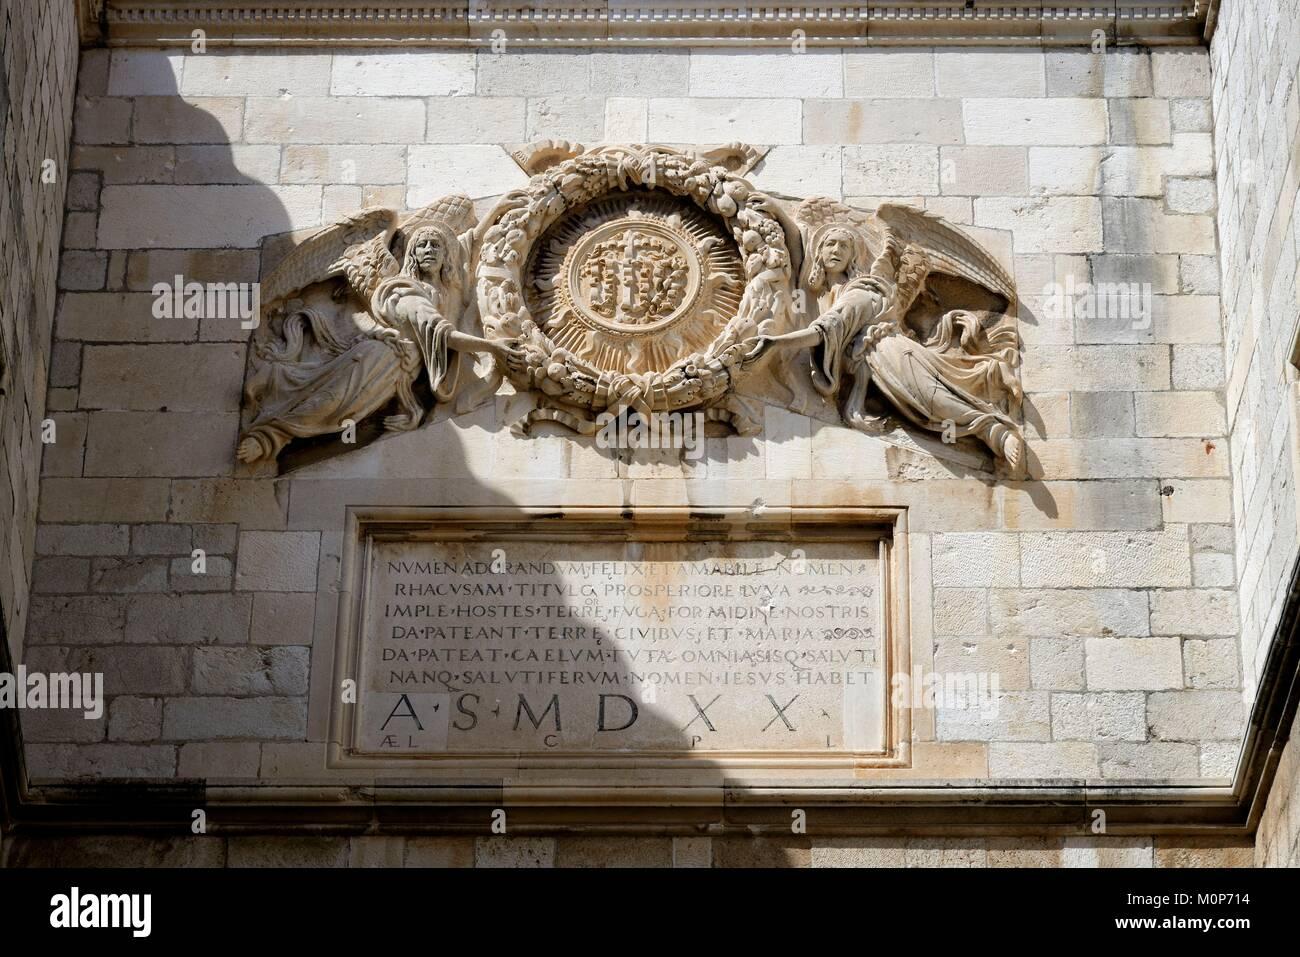 Croatia,Dalmatia,Dalmatian Coast,Dubrovnik,historical centre listed as World Heritage by UNESCO,the Sponza Palace - Stock Image